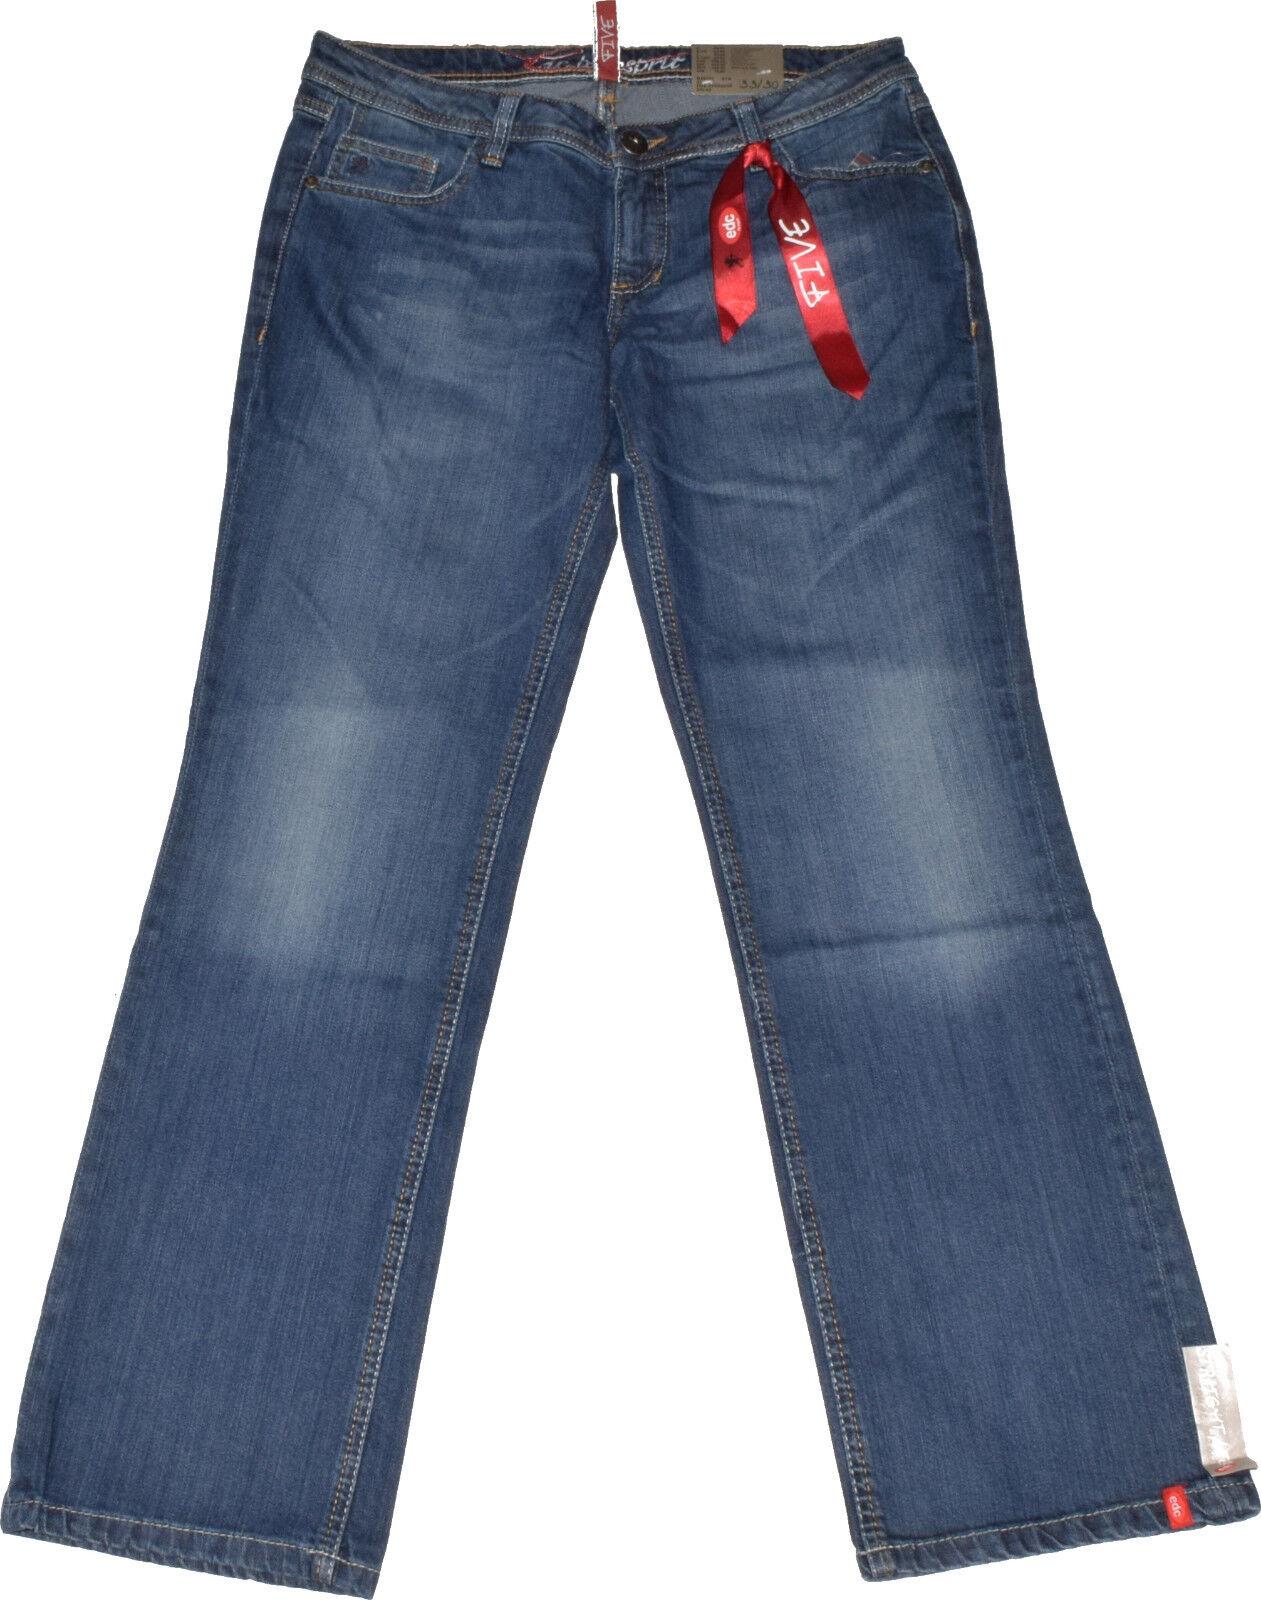 Edc by Esprit Five Jeans  Gr. 28 34  Vintage  Stretch  Used Look  NEU